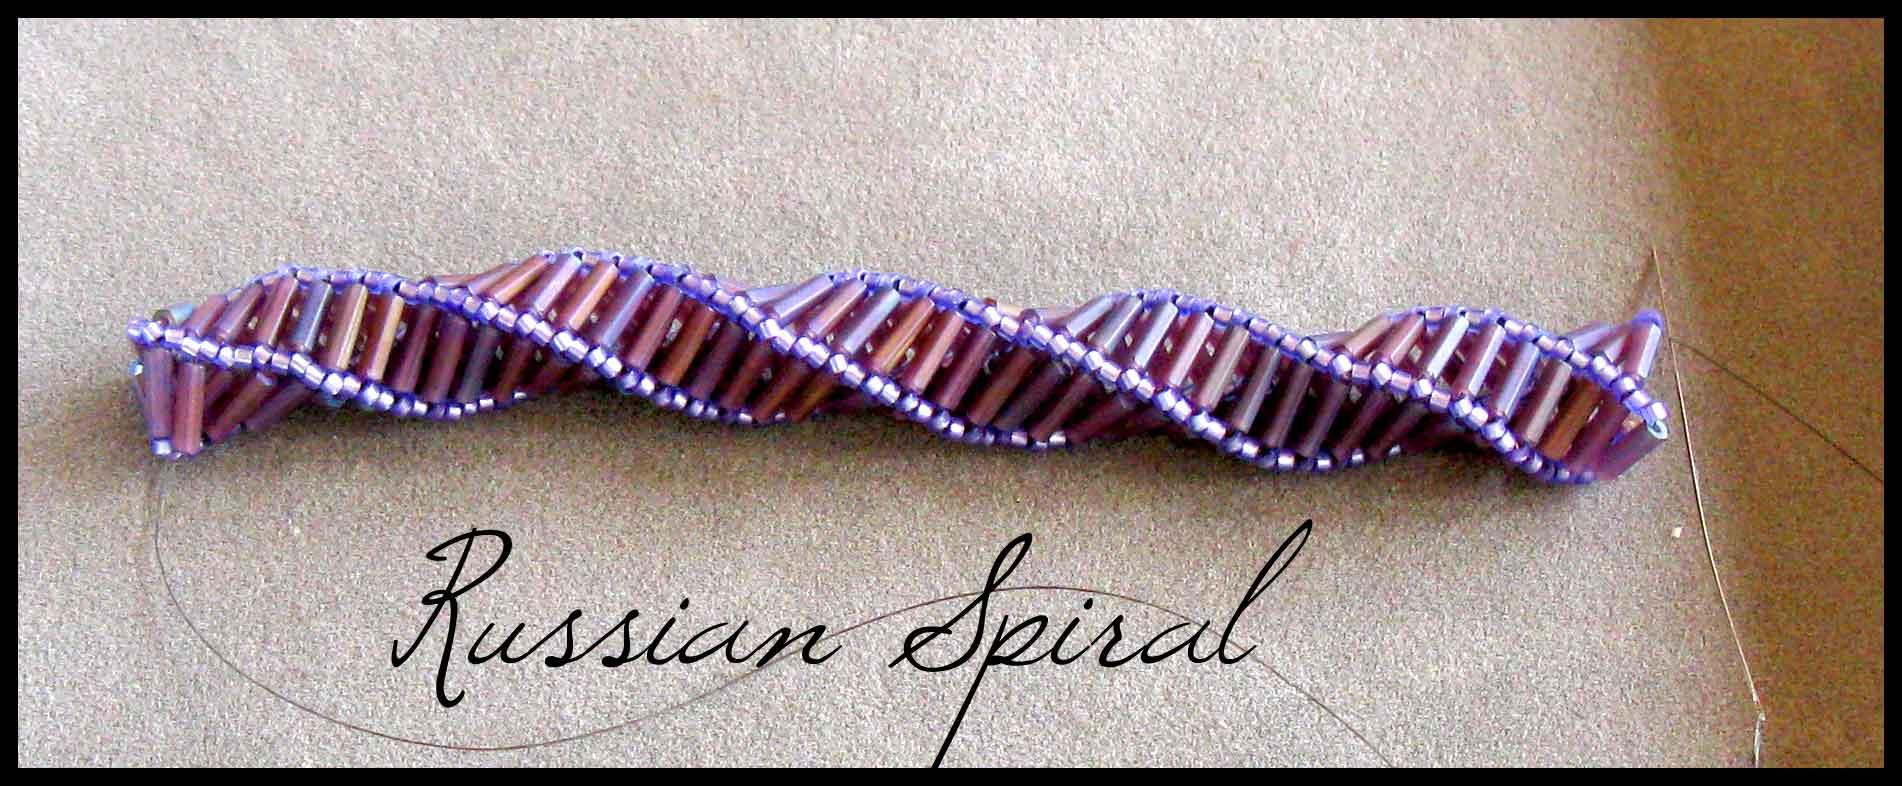 Beadweaving Russian Spiral Stitch